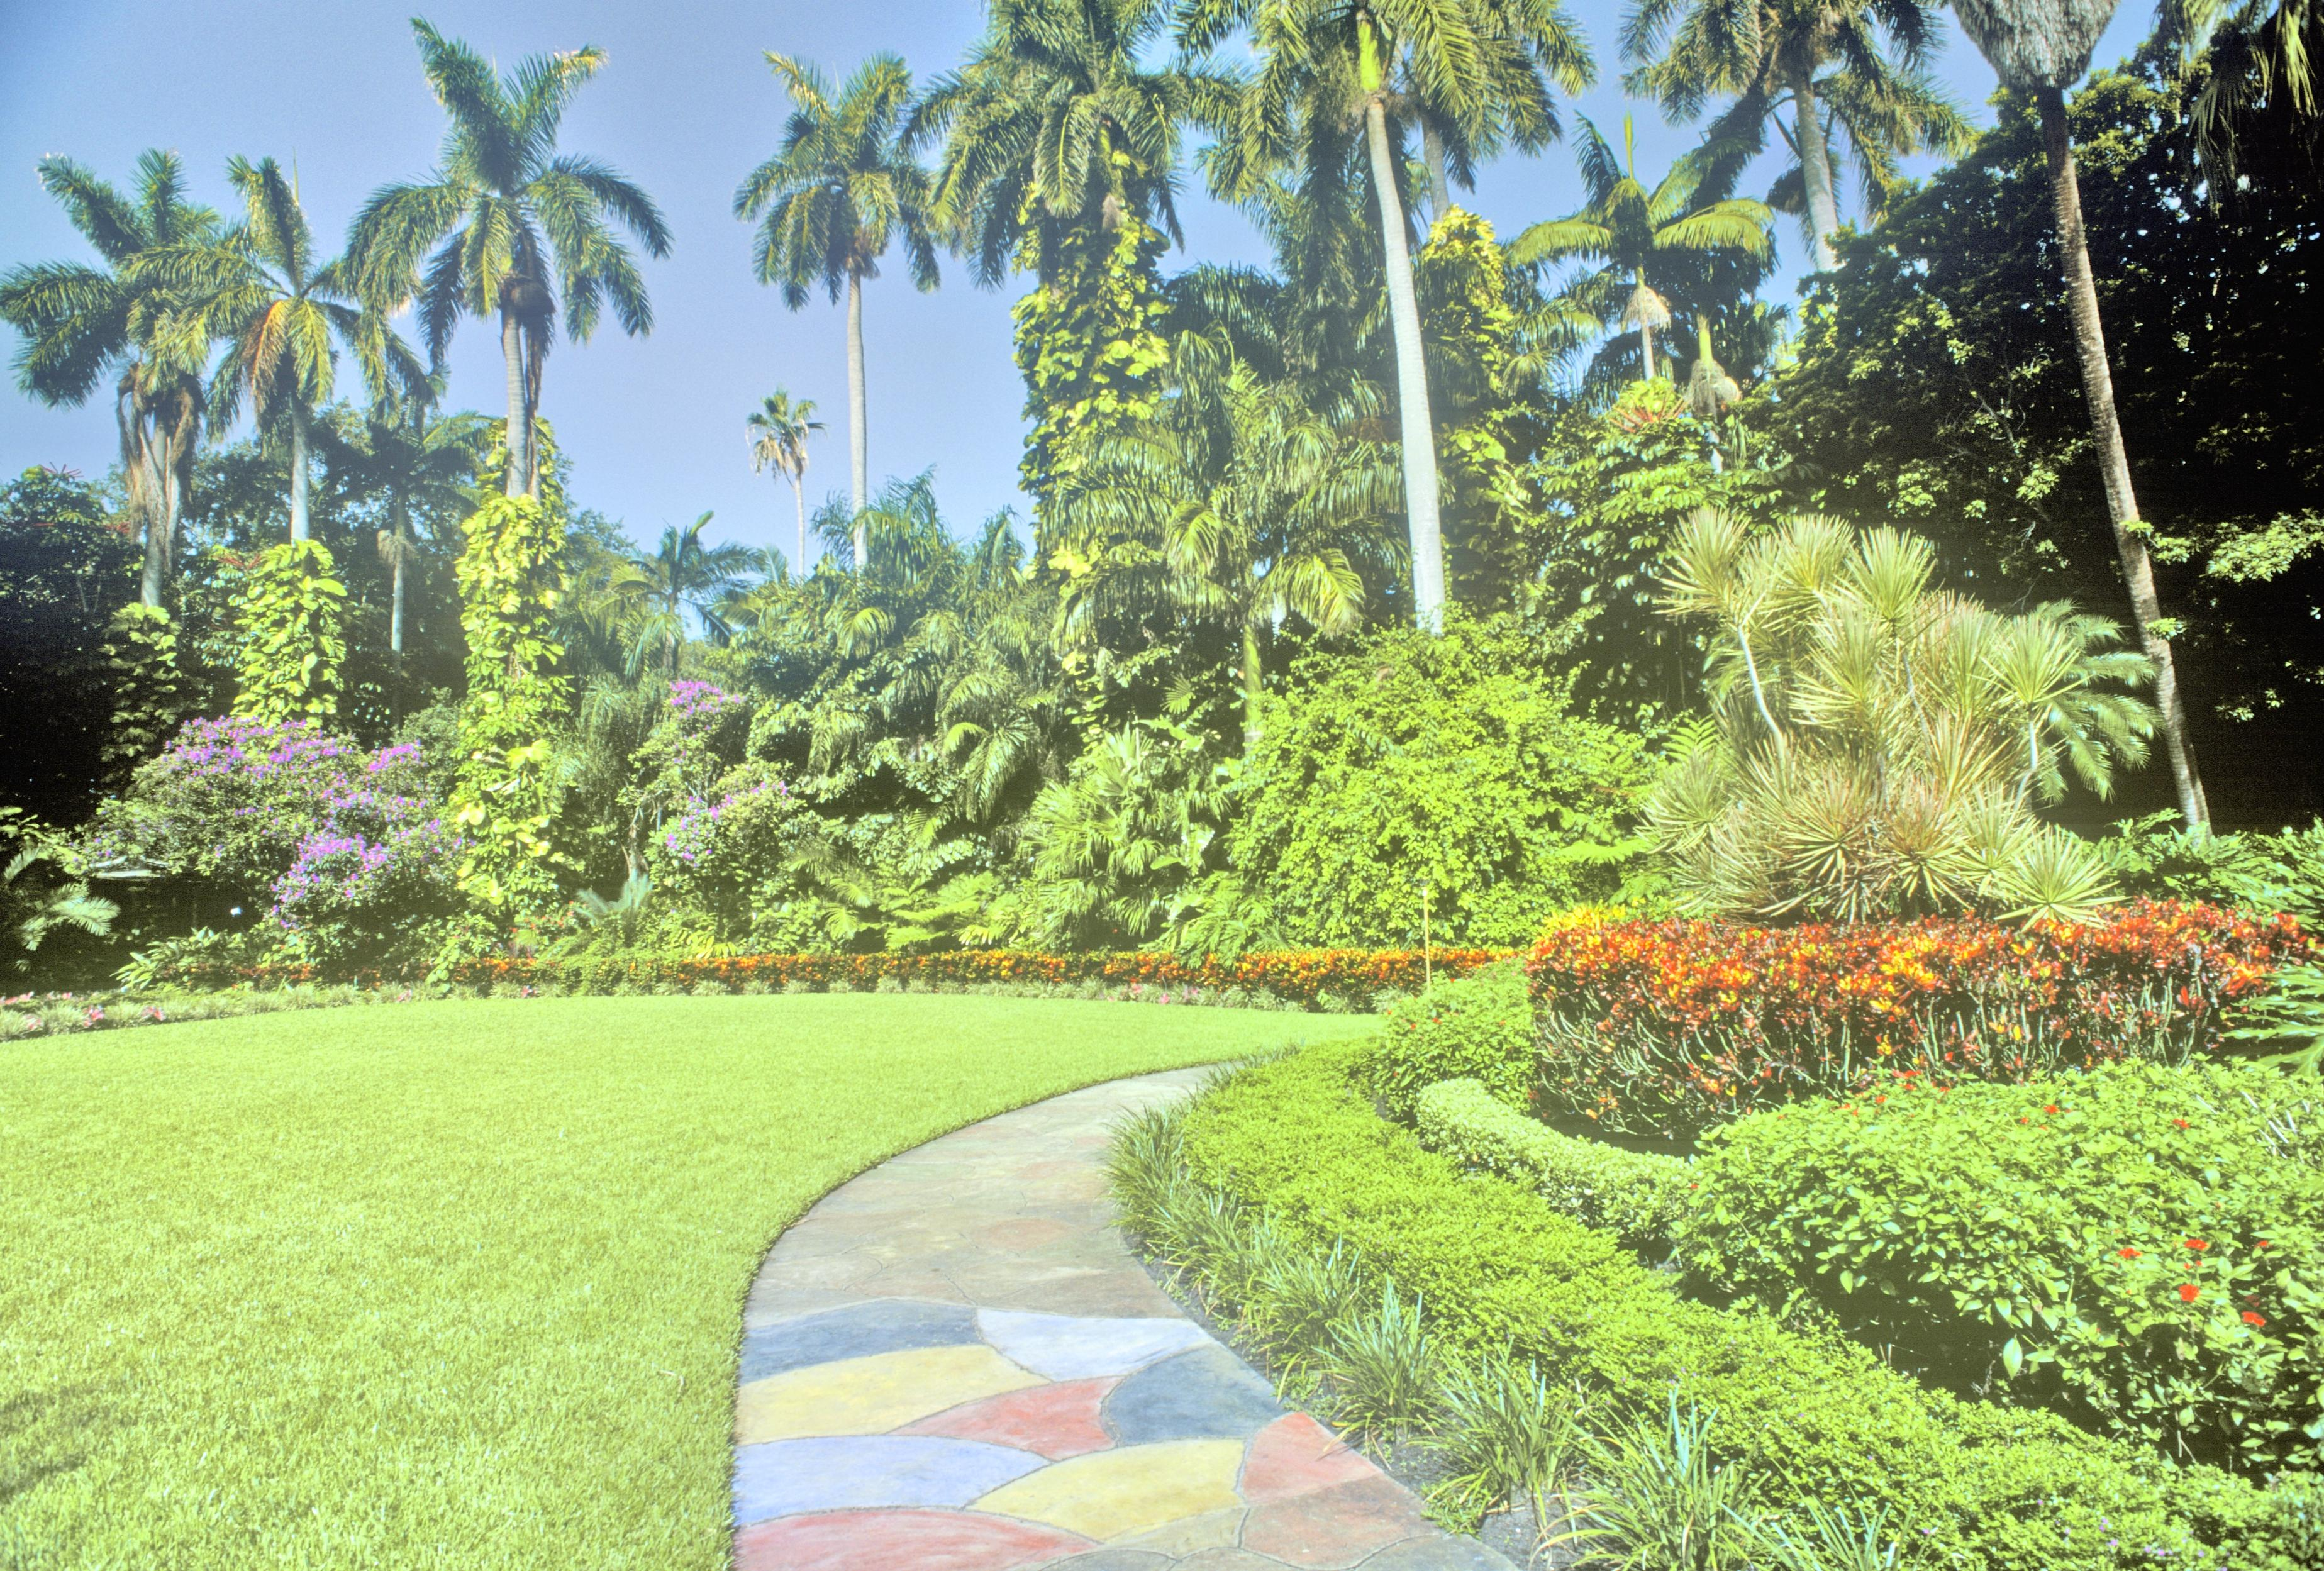 Sunken Gardens Travel Guidebook Must Visit Attractions In St Petersburg Sunken Gardens Nearby Recommendation Trip Com